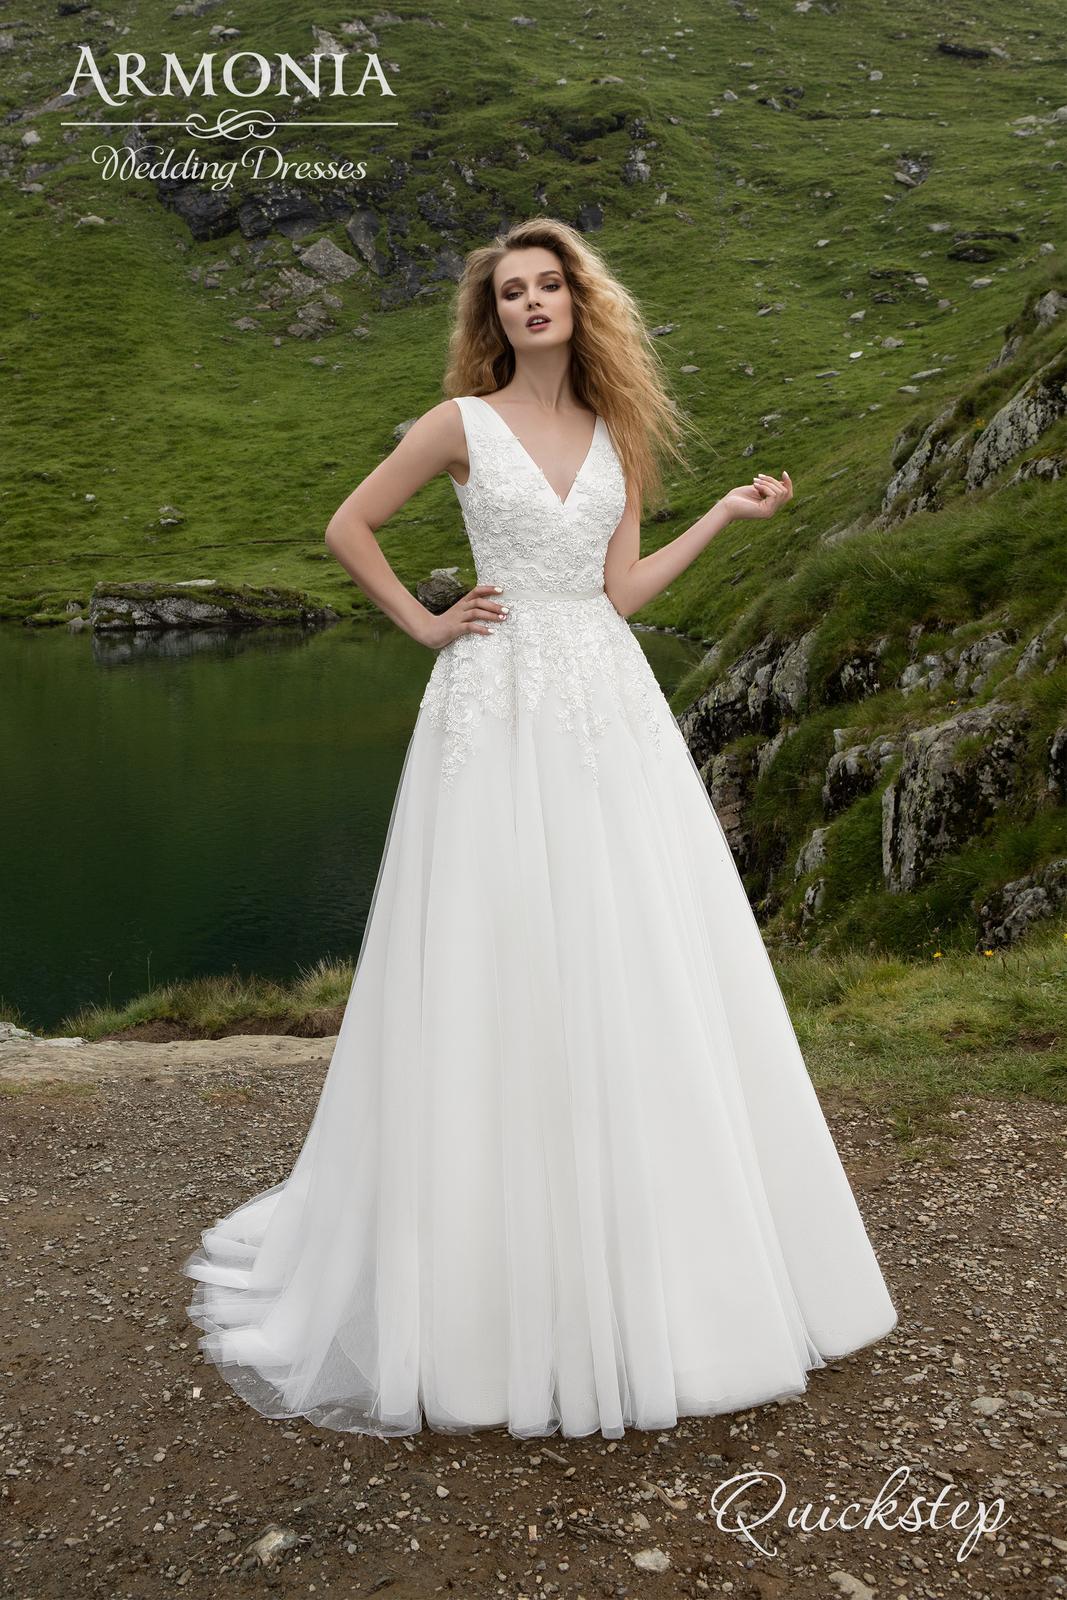 Svatební šaty Armonia Quickstep - Obrázek č. 1